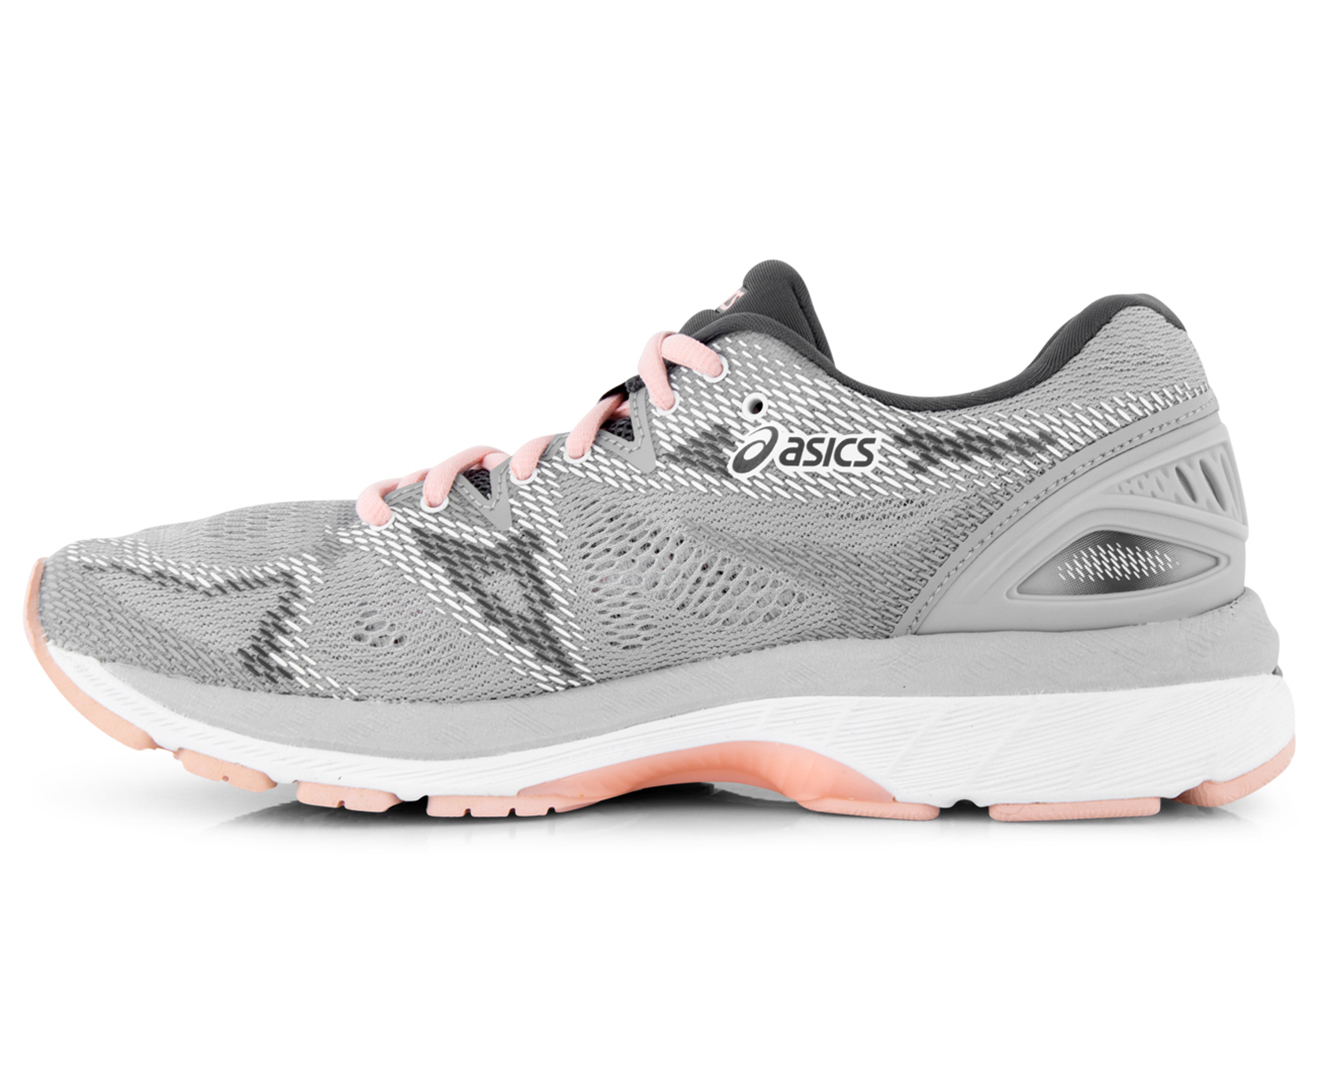 8cf30ff45179 ASICS Women s GEL-Nimbus 20 Shoe - Mid Grey Seashell Pink